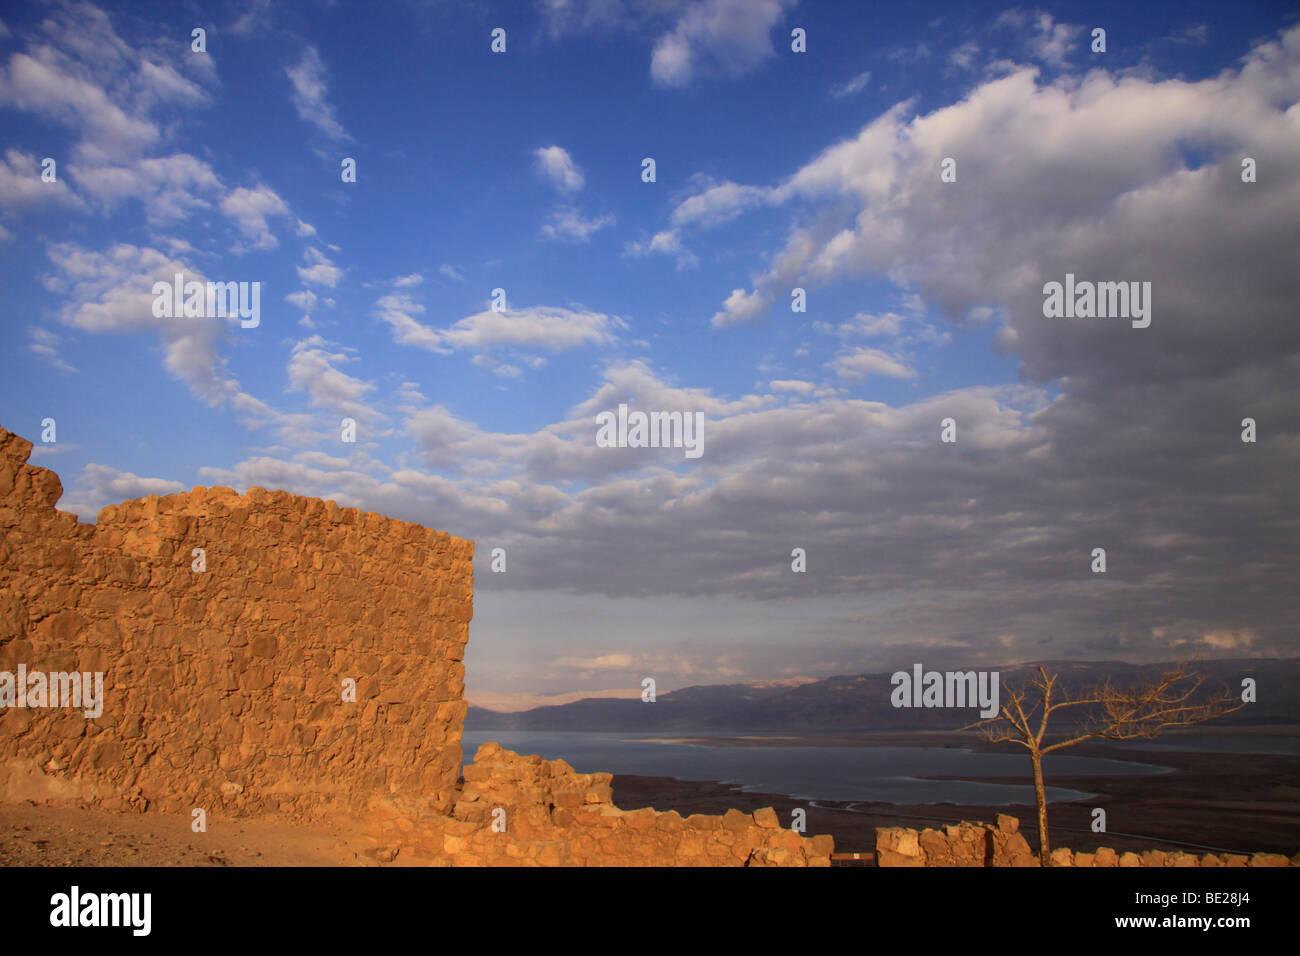 Israel, Judean desert, a view towards the Dead Sea from Masada Stock Photo